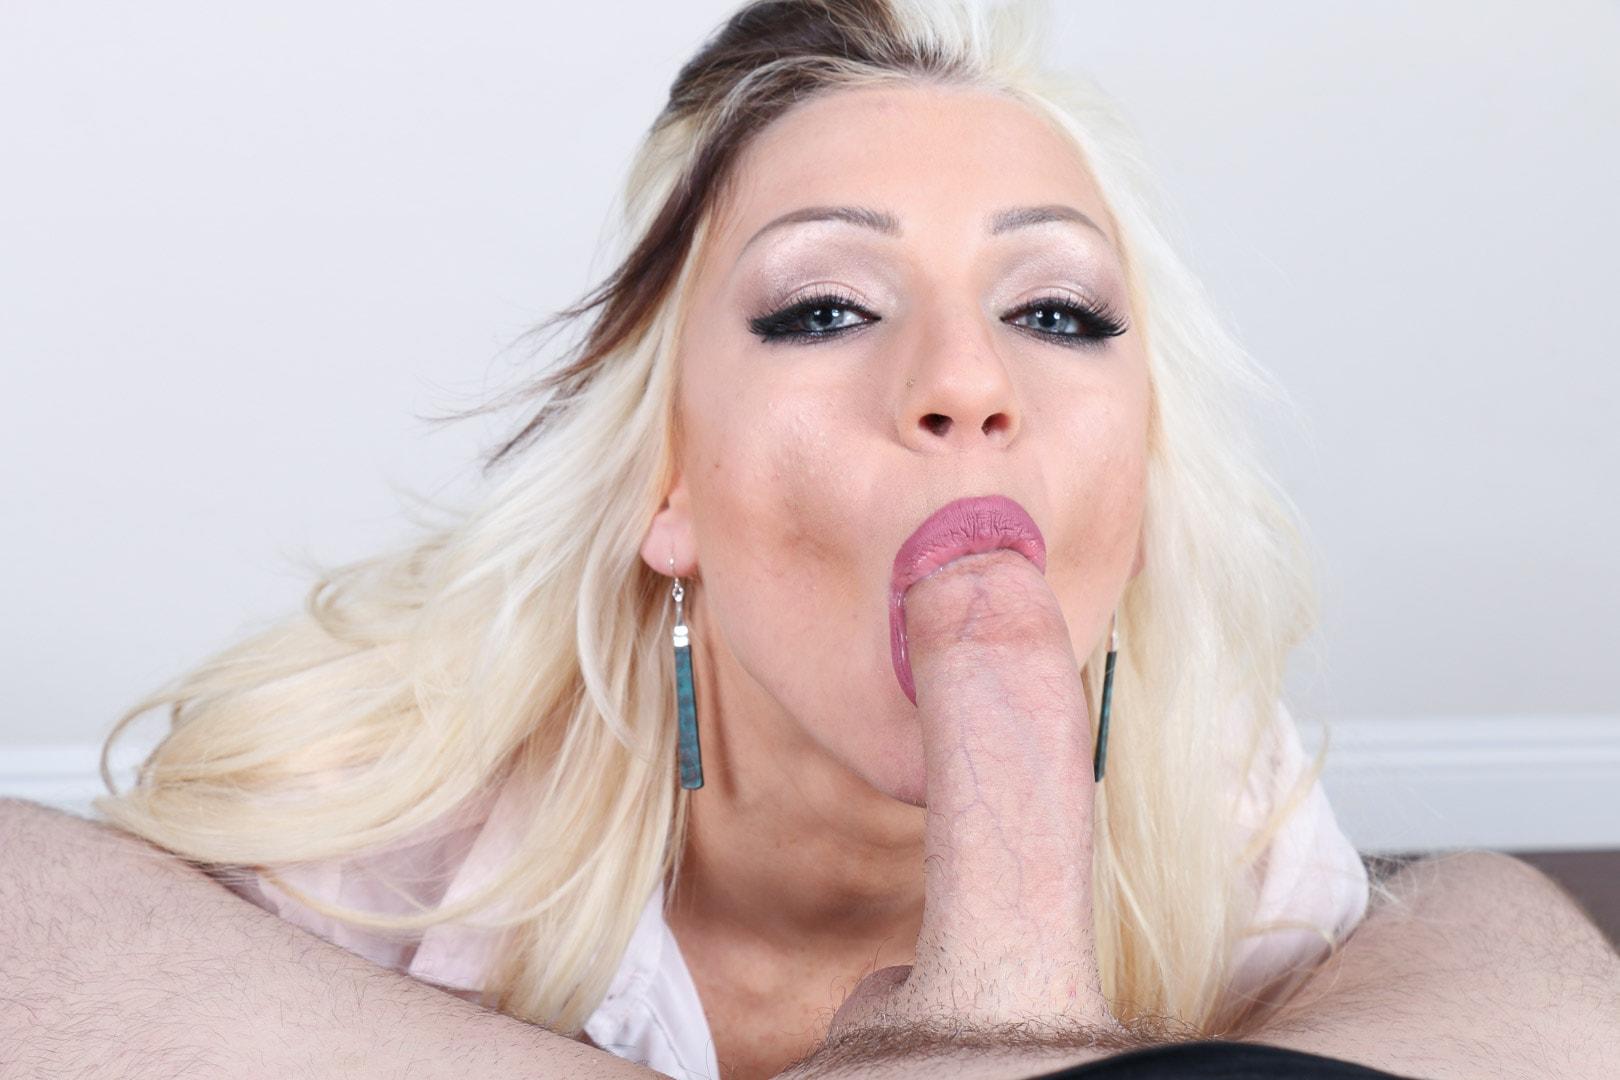 Sheena lee lingerie